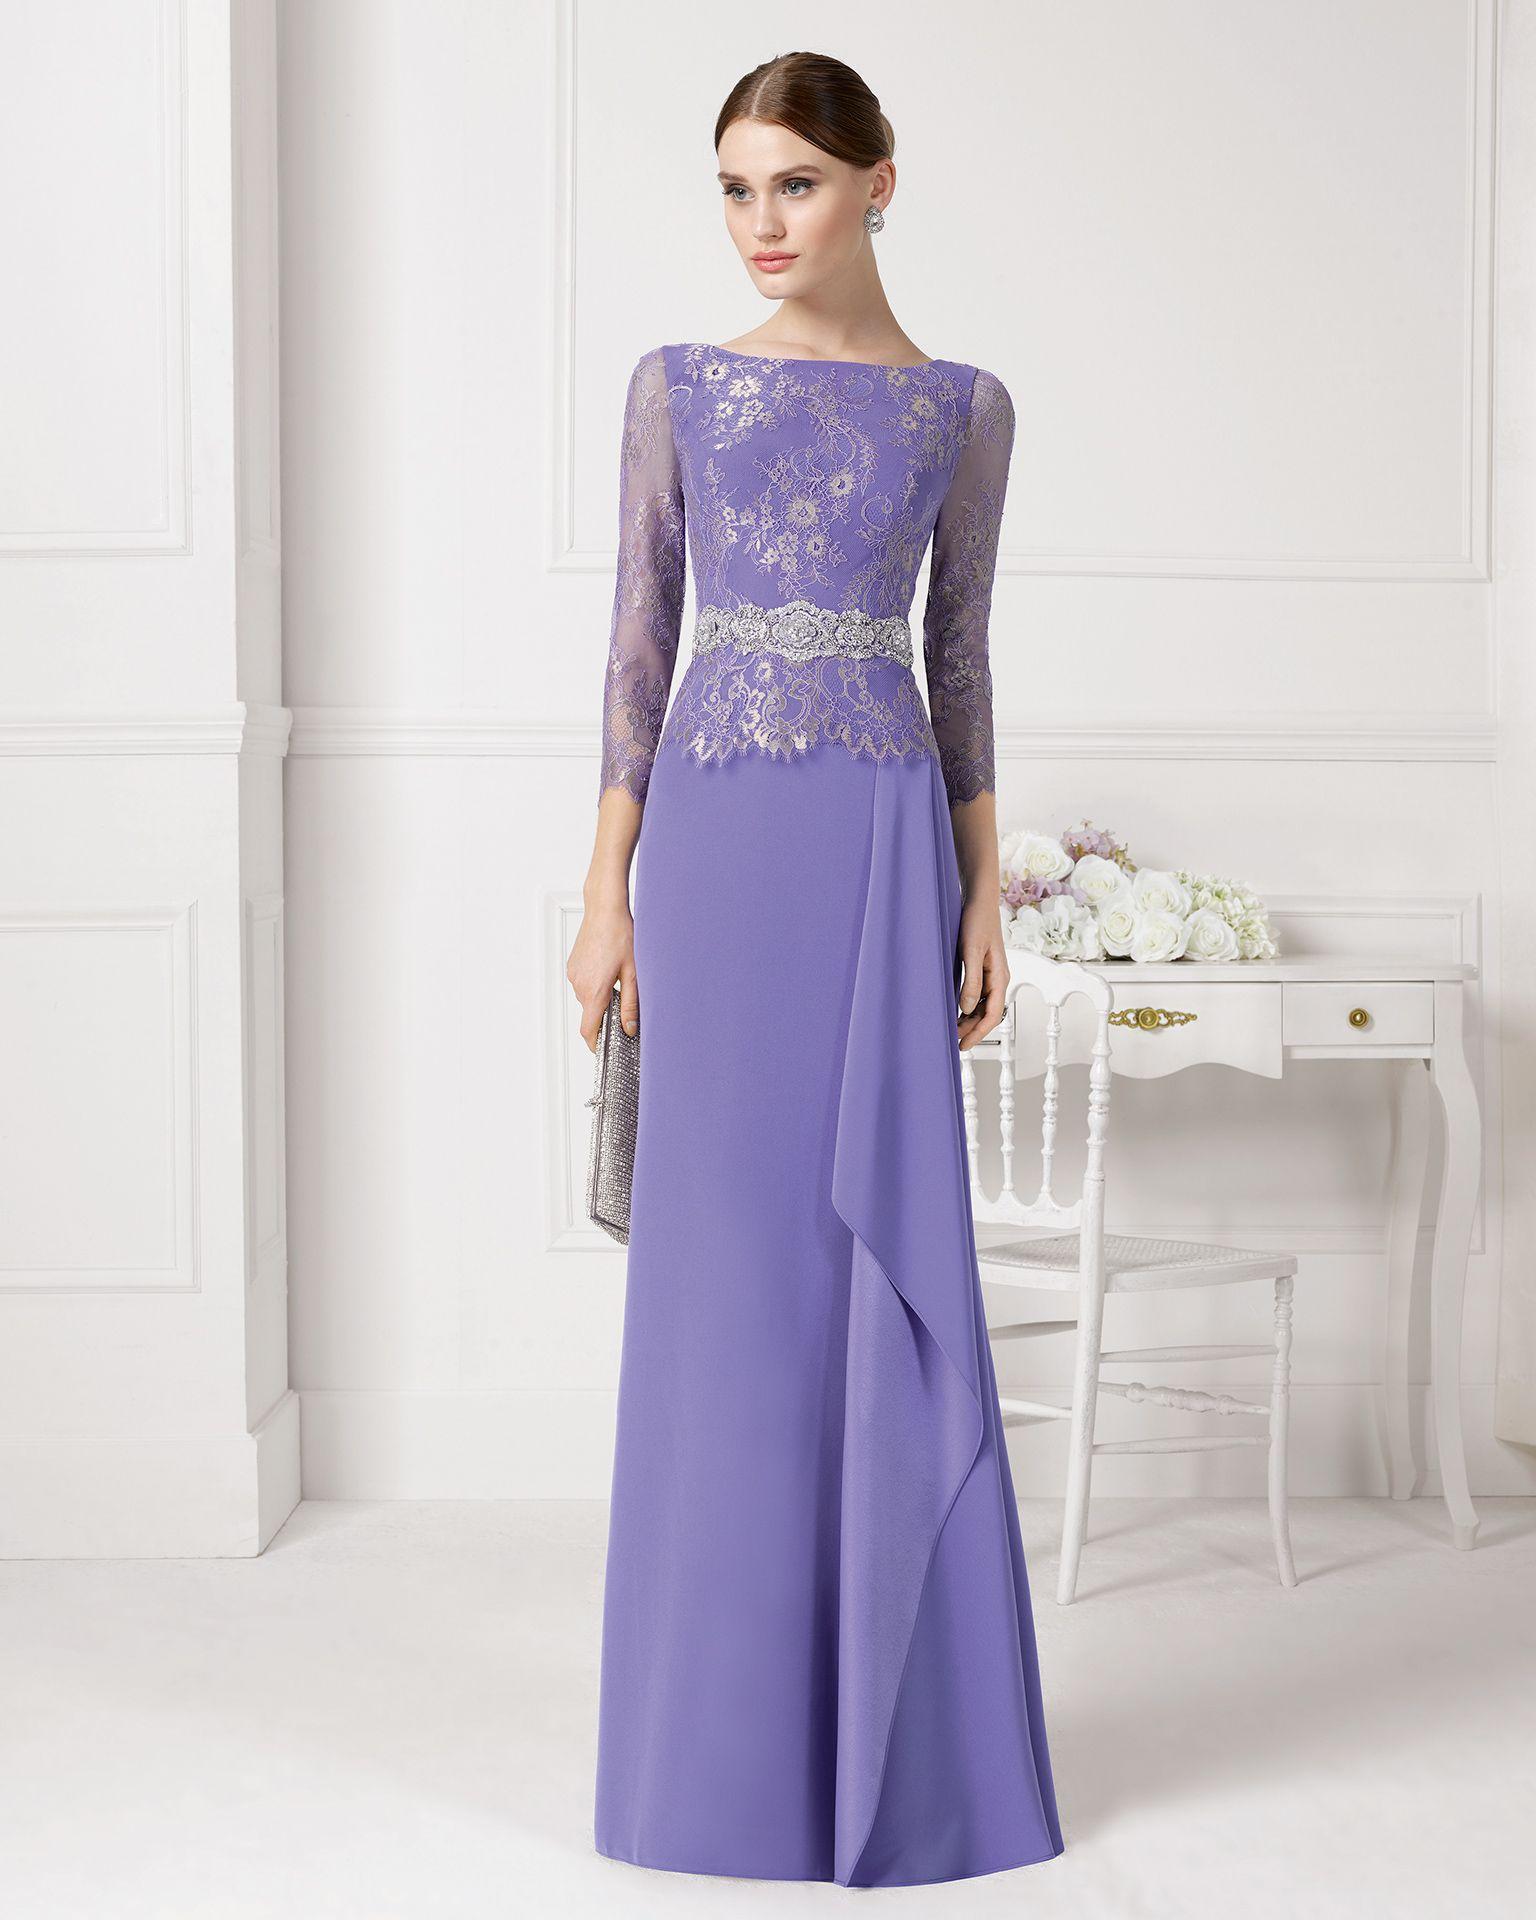 Vestido color lila de manga larga. Código: 9u158 | Vestidos de ...